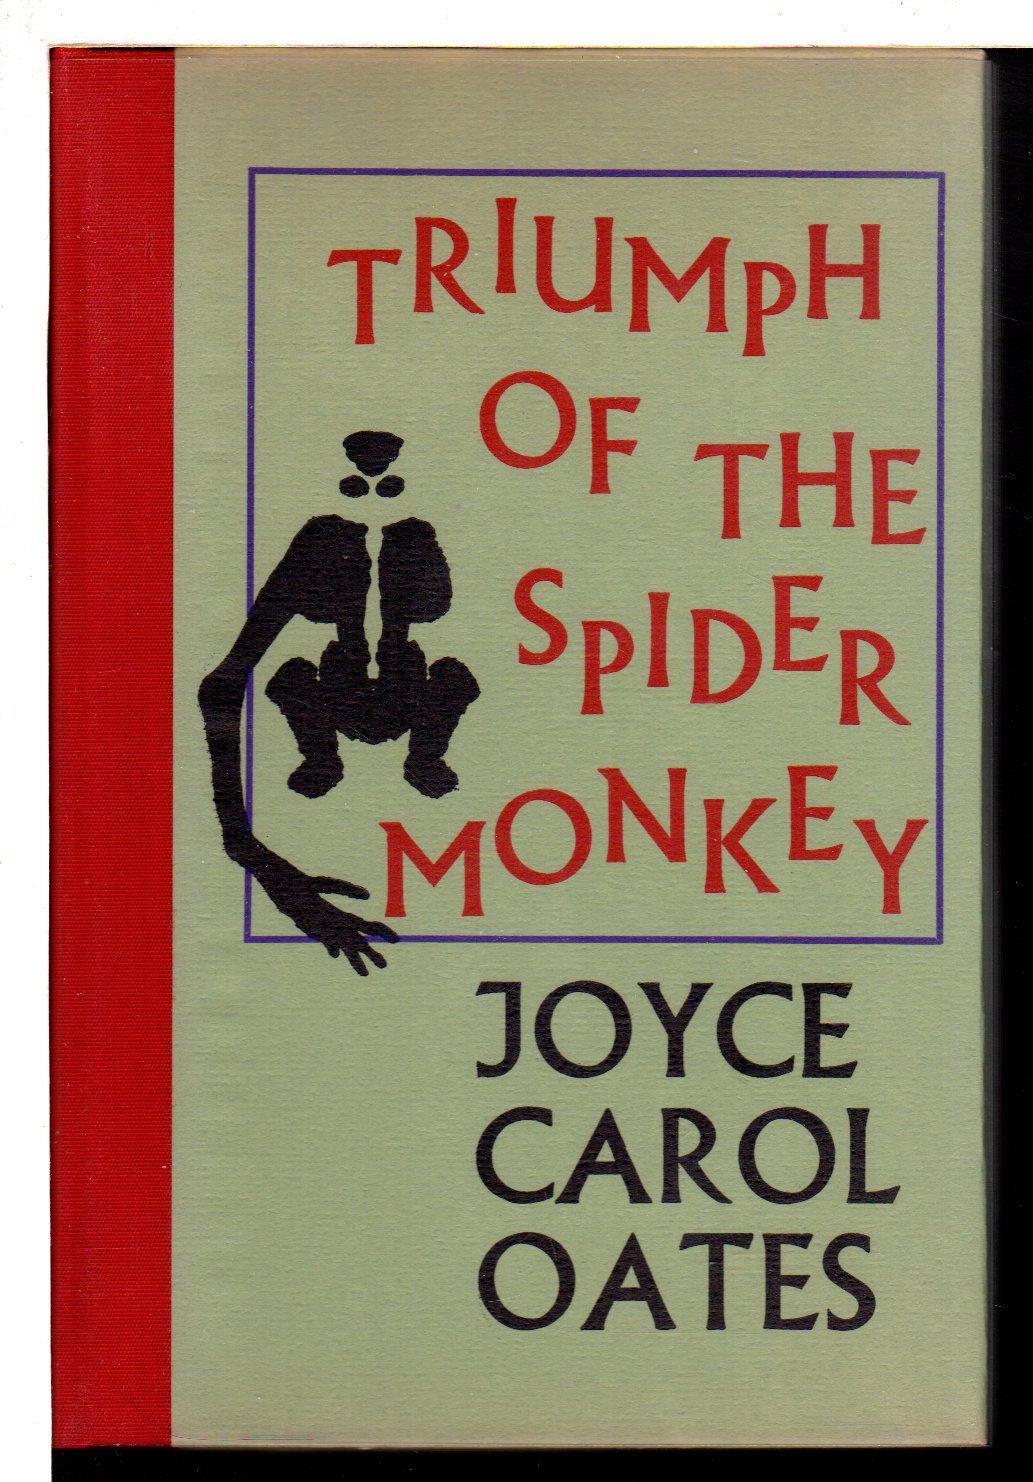 TRIUMPH OF THE SPIDER MONKEY. Oates, Joyce Carol. Hardcover